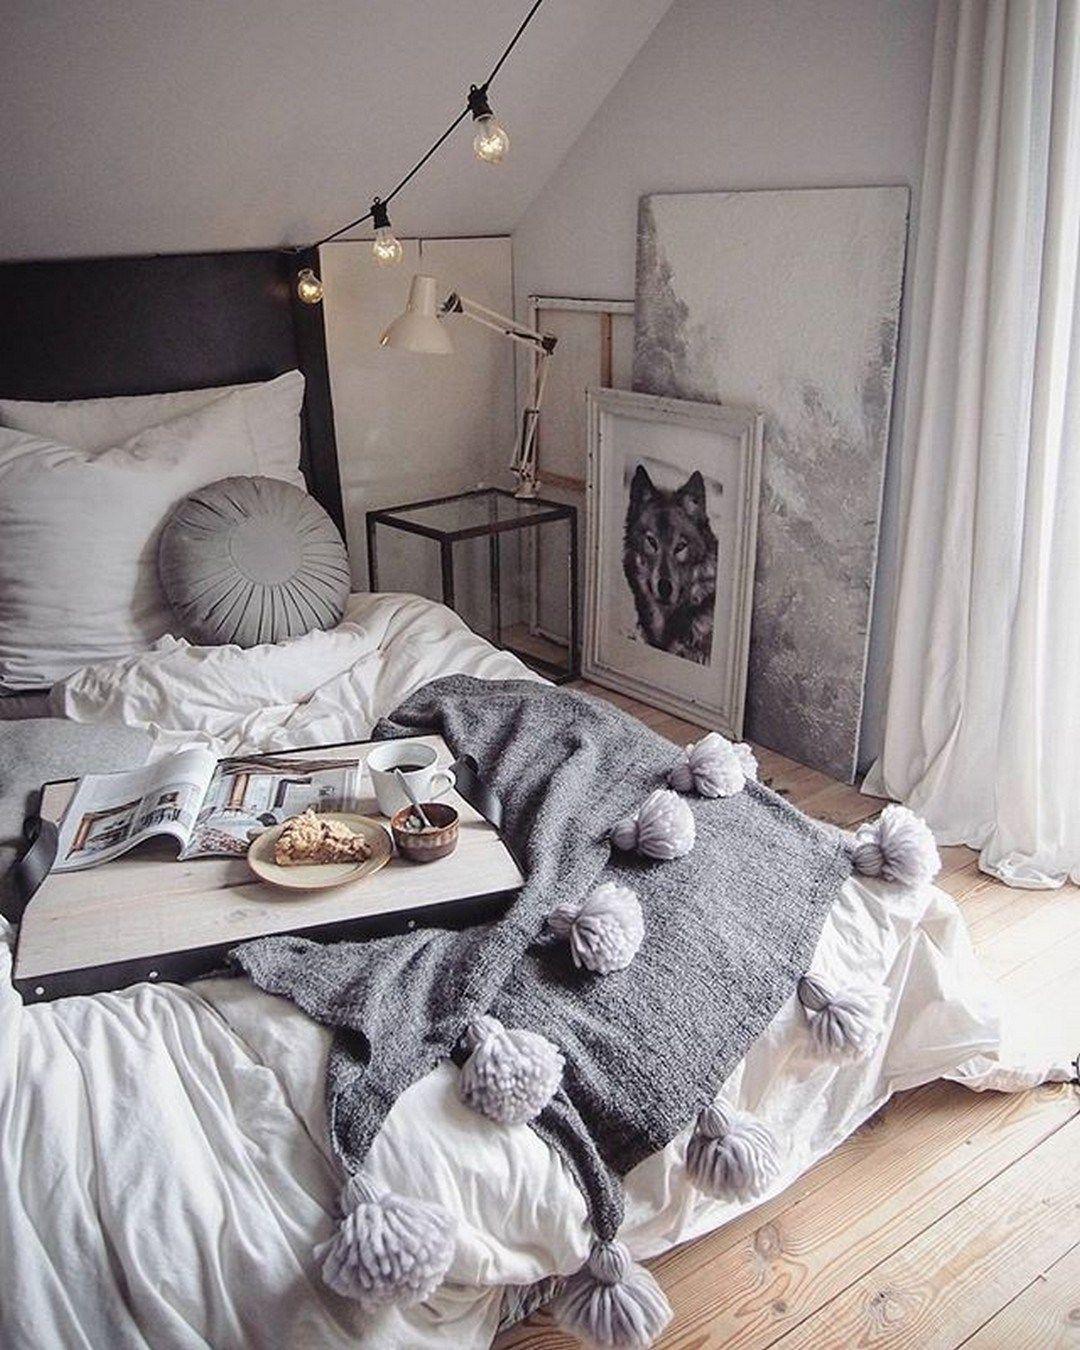 Elegant Cozy Bedroom Ideas With Small Spaces 28 Bedroom Decor Cozy Home Decor Bedroom Room Inspiration Bedroom